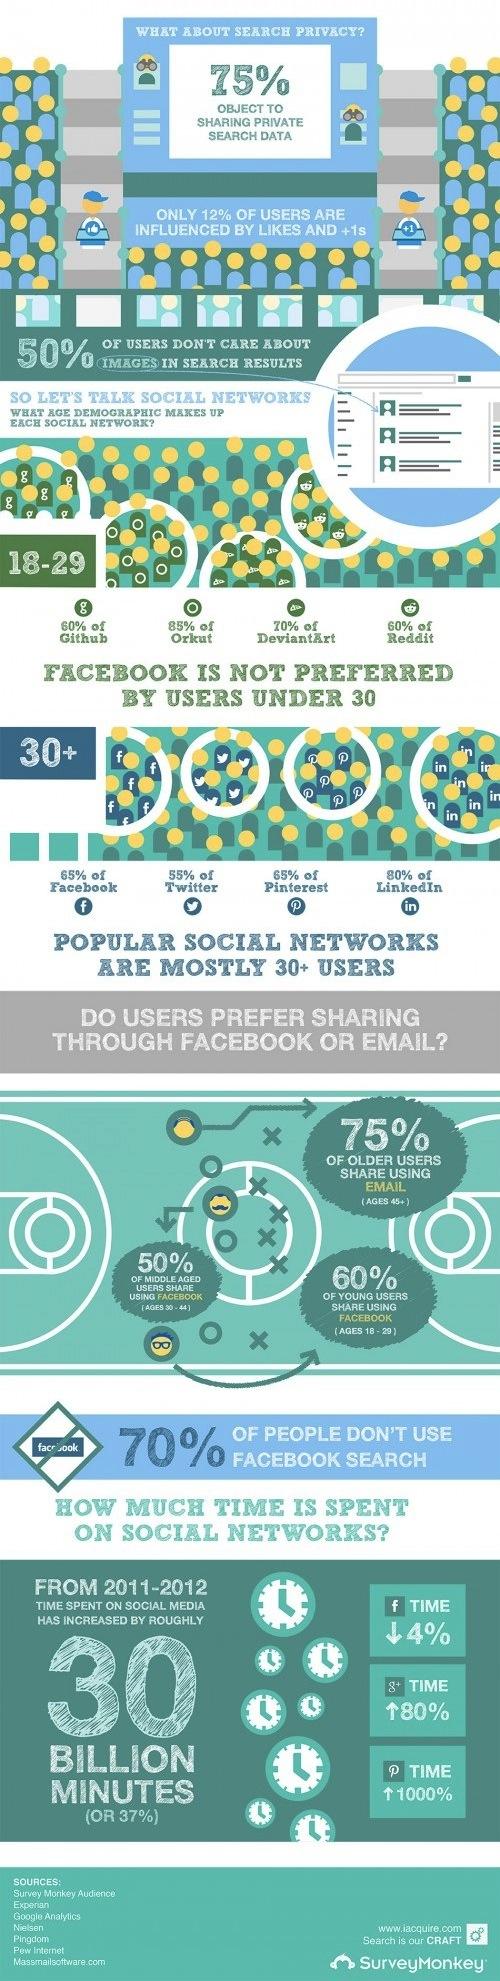 Social-Media-And-Behavior-Study-Infographic-500x2190